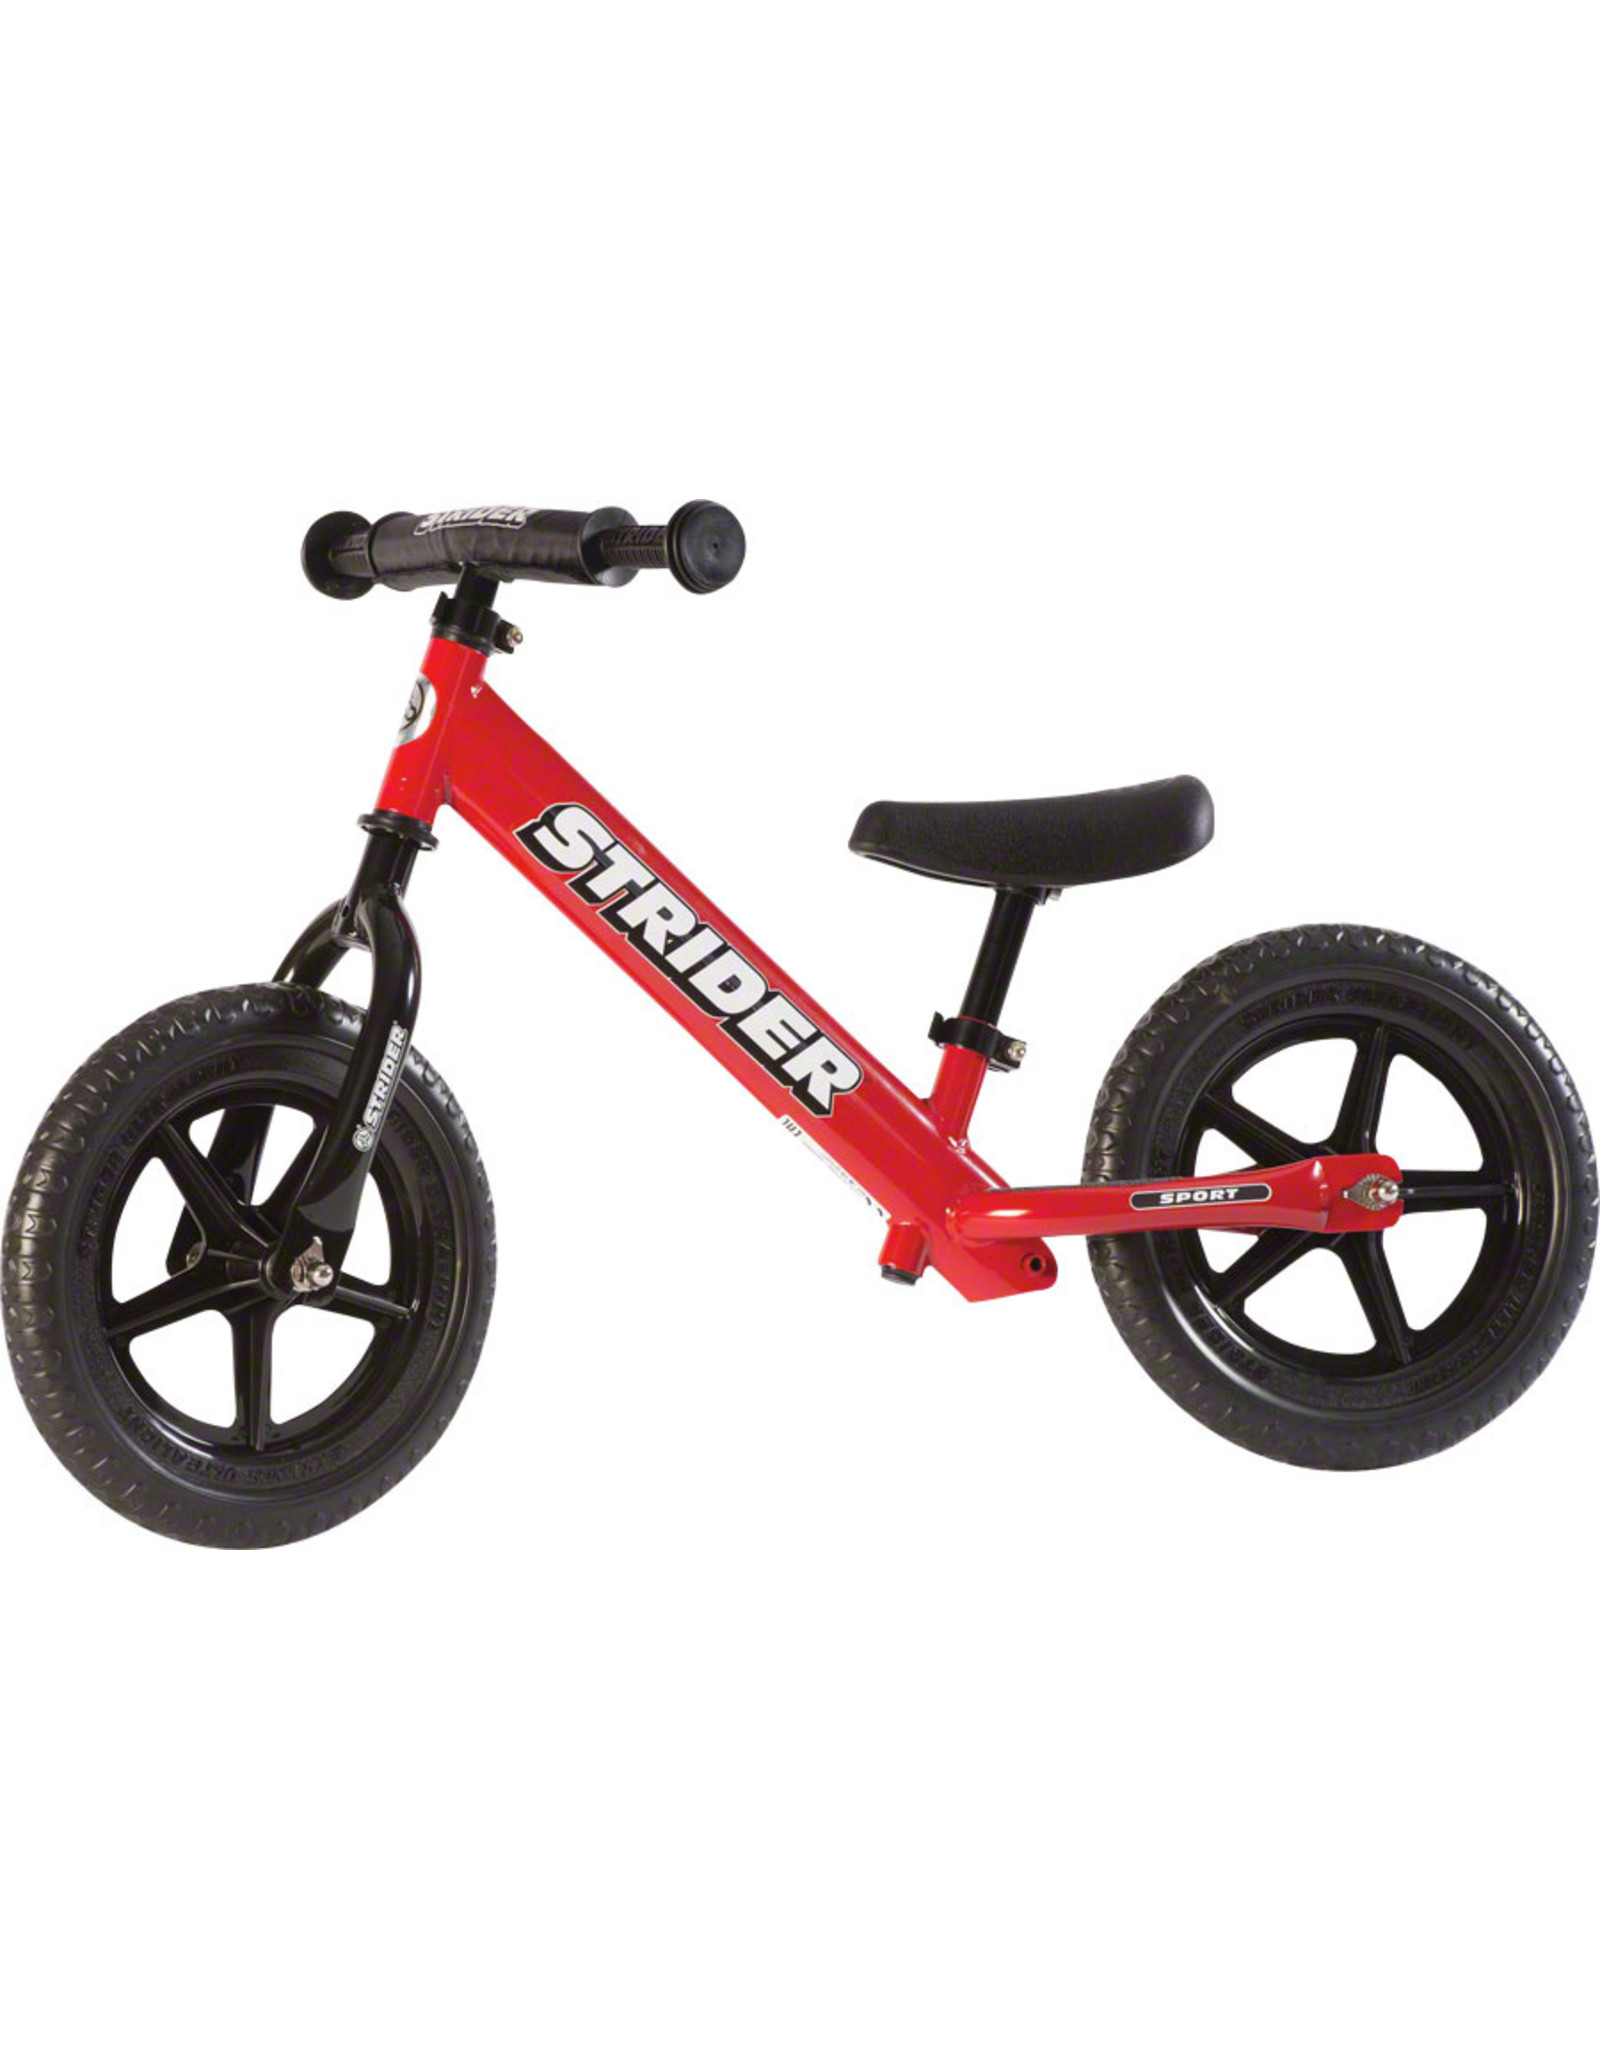 Strider 12 Sport Kids Balance Bike: Red